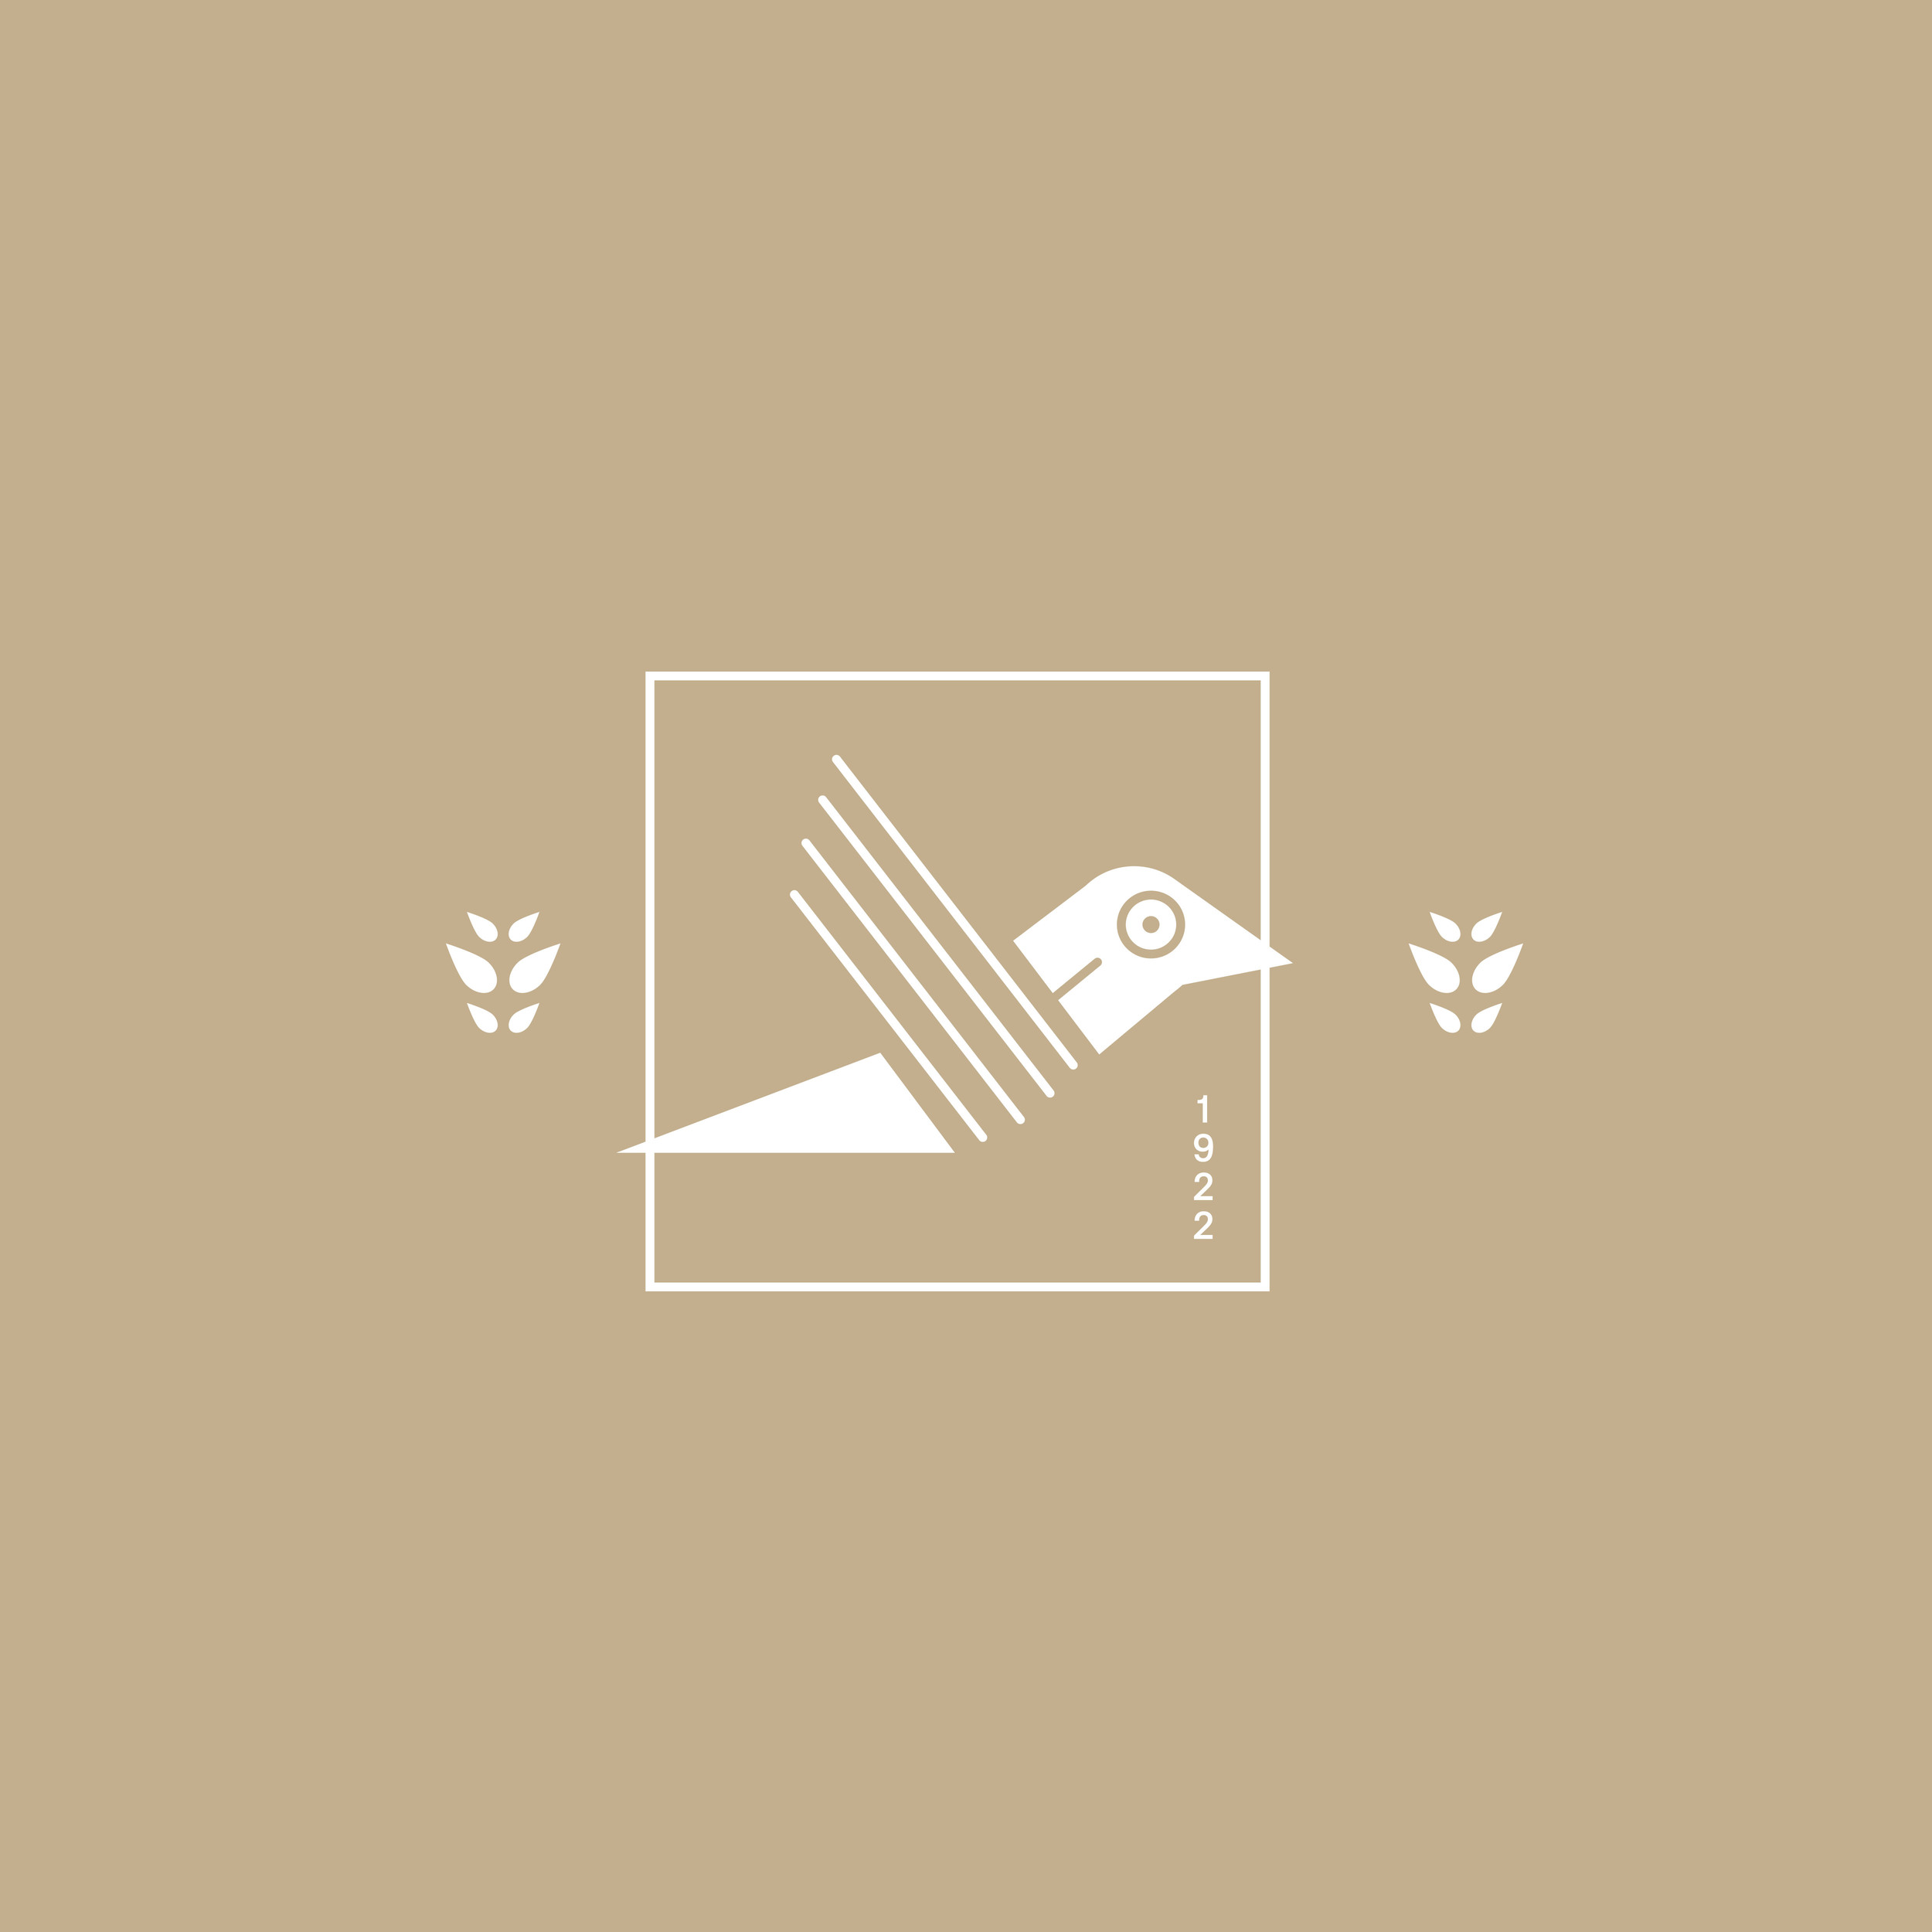 FS_Illo_Bird.jpg